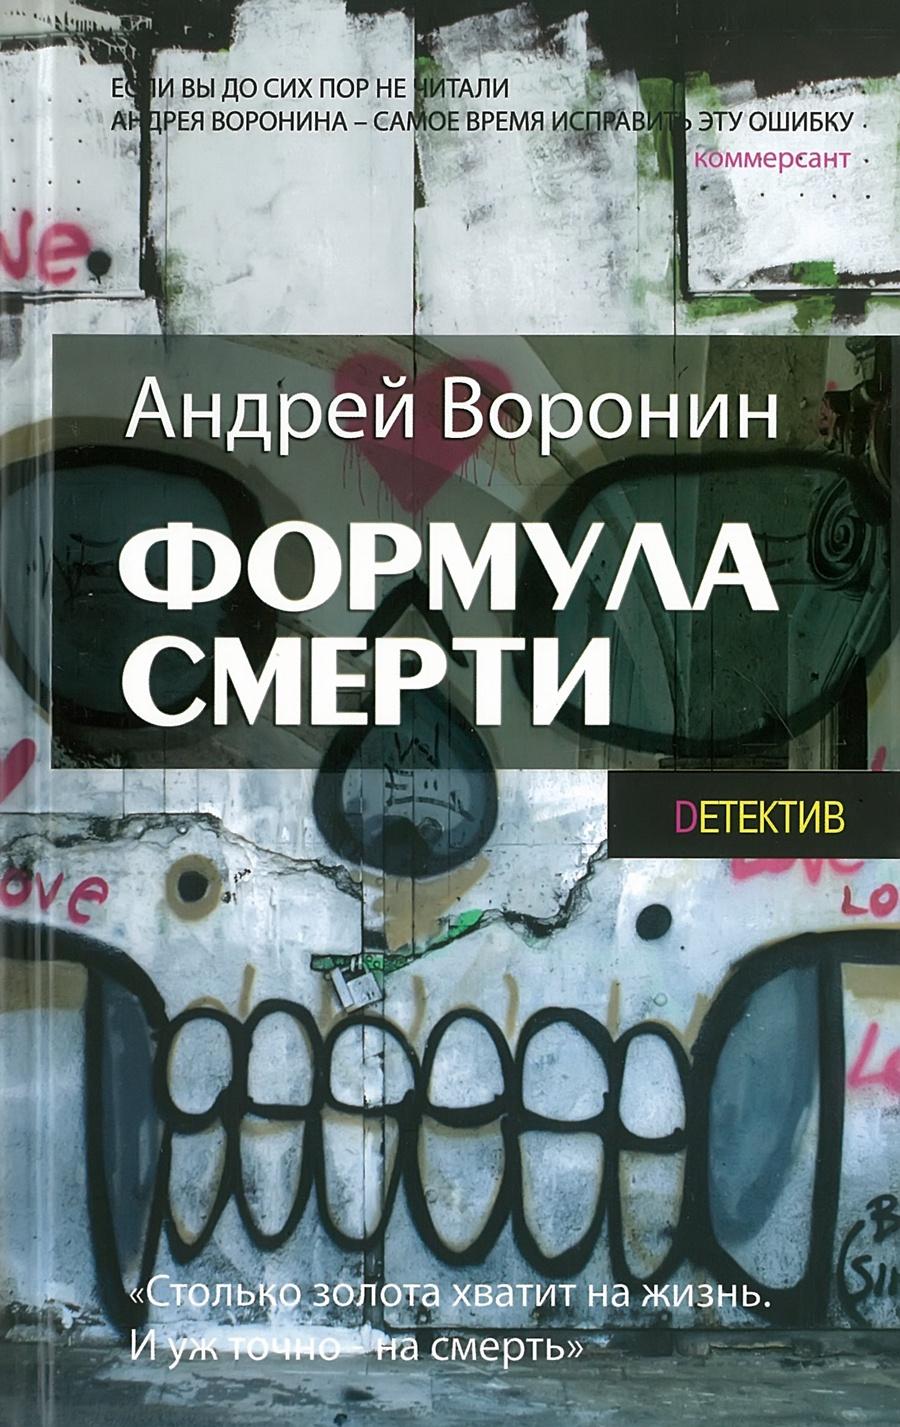 Андрей Воронин Формула смерти